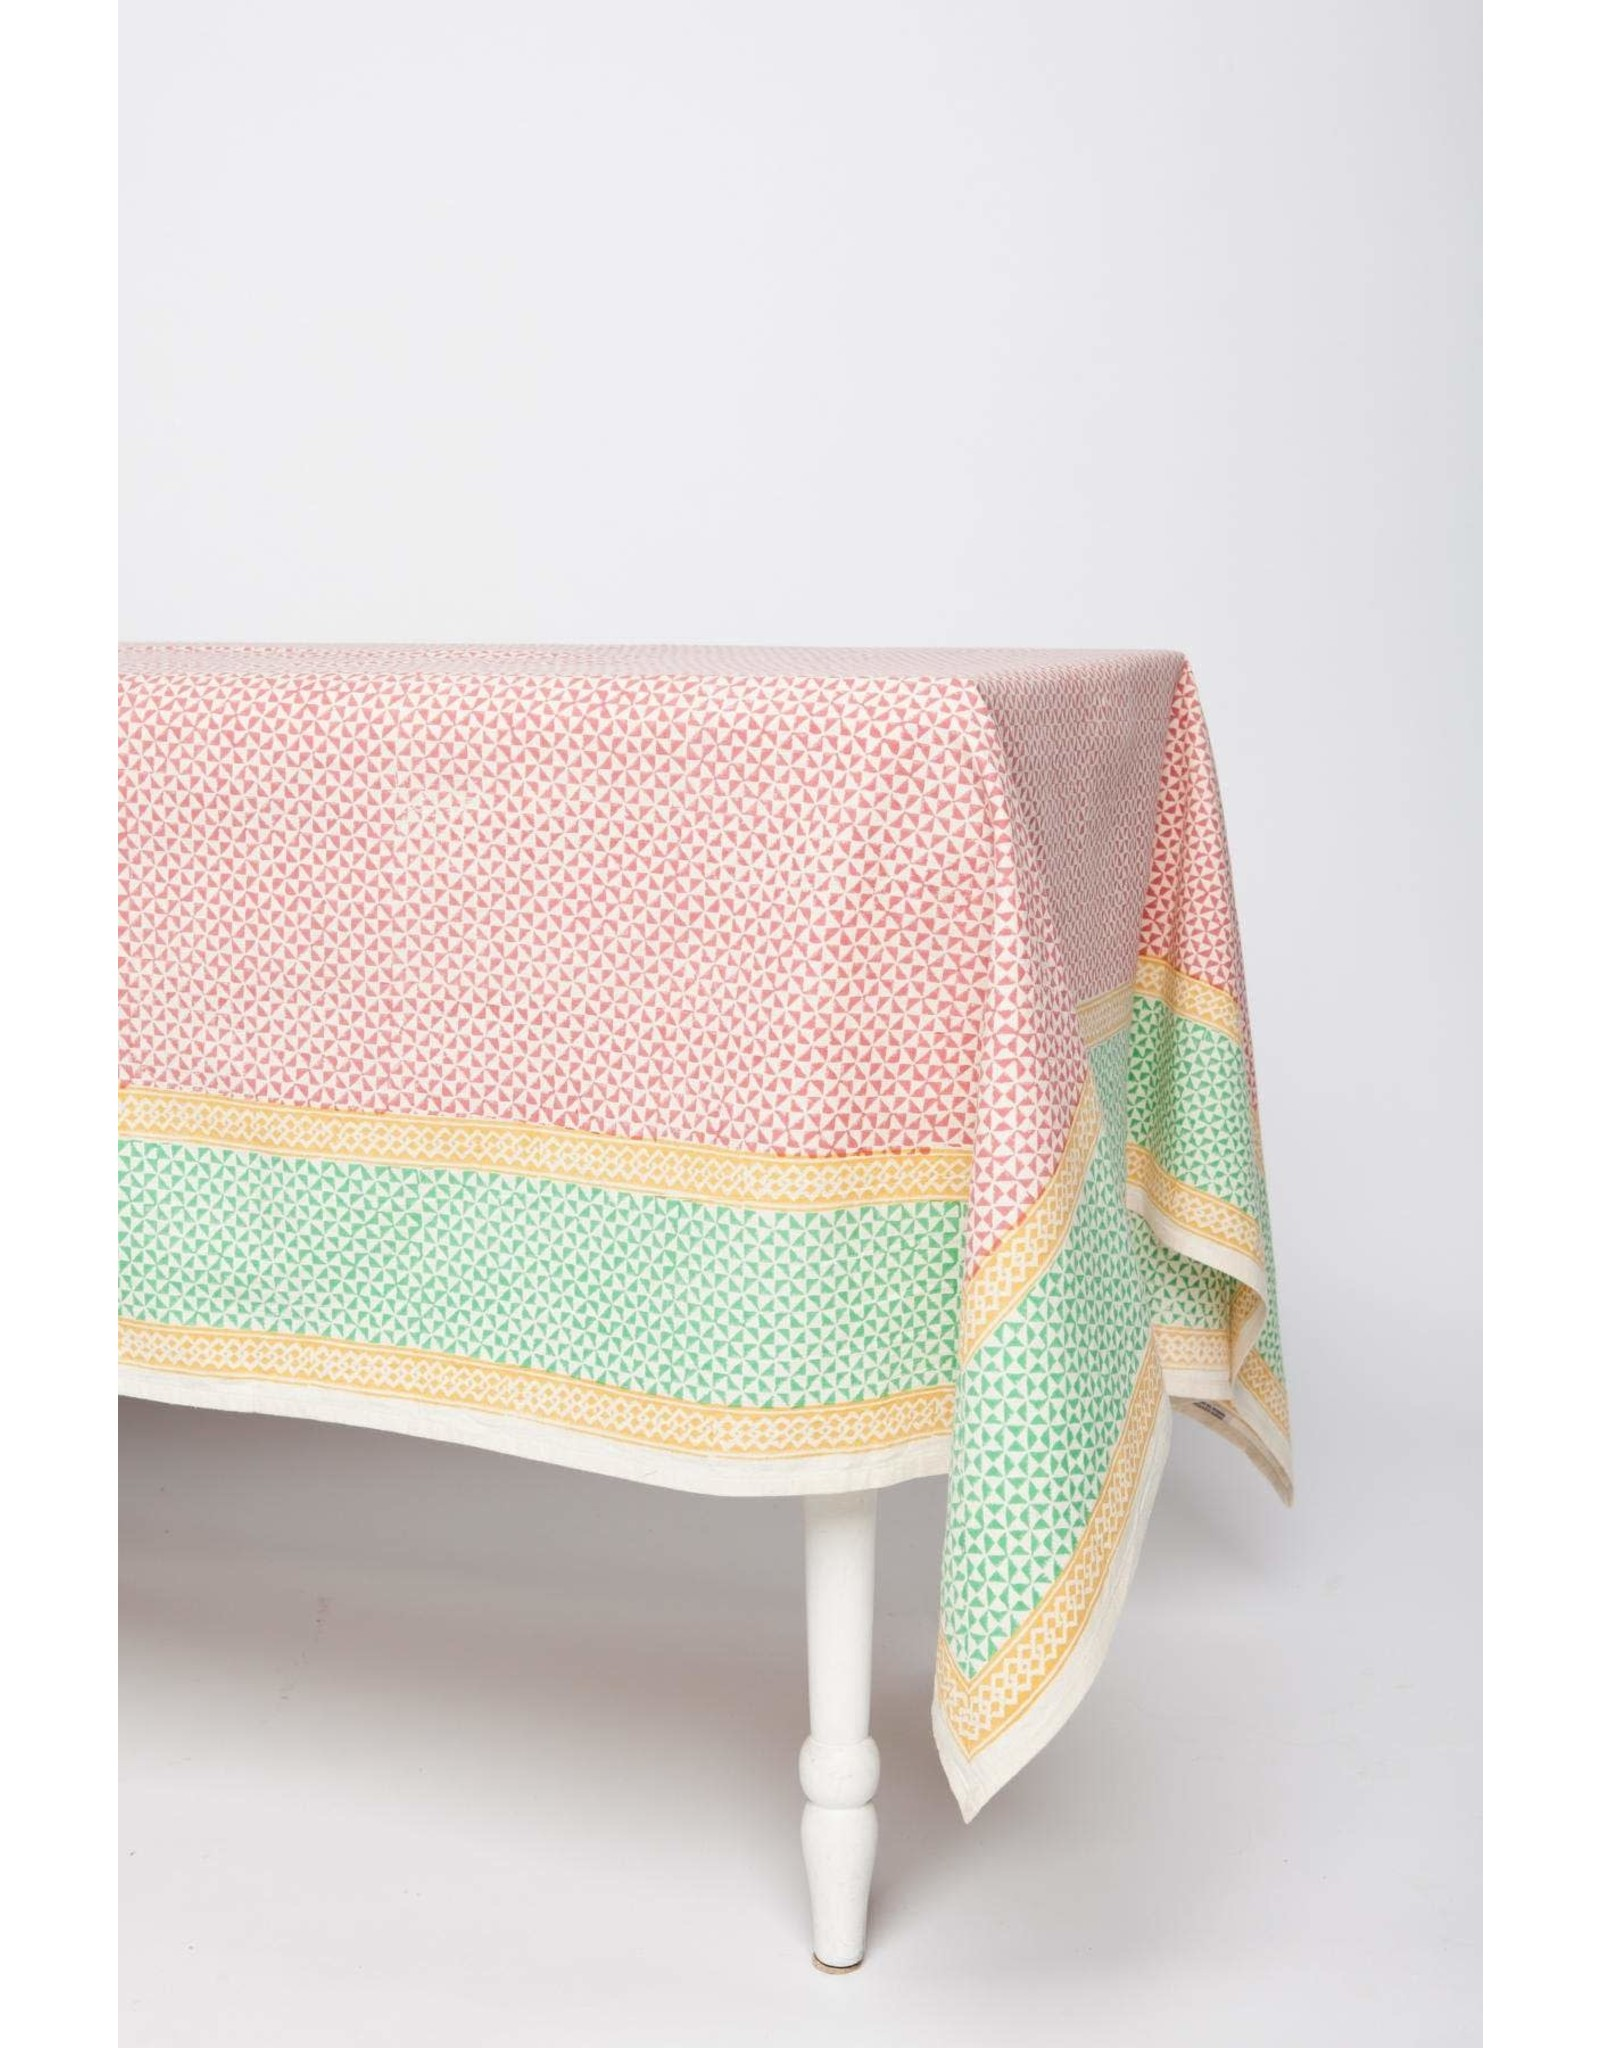 90 x 60 Block Printed Cotton Tablecloth Pinwheel, India